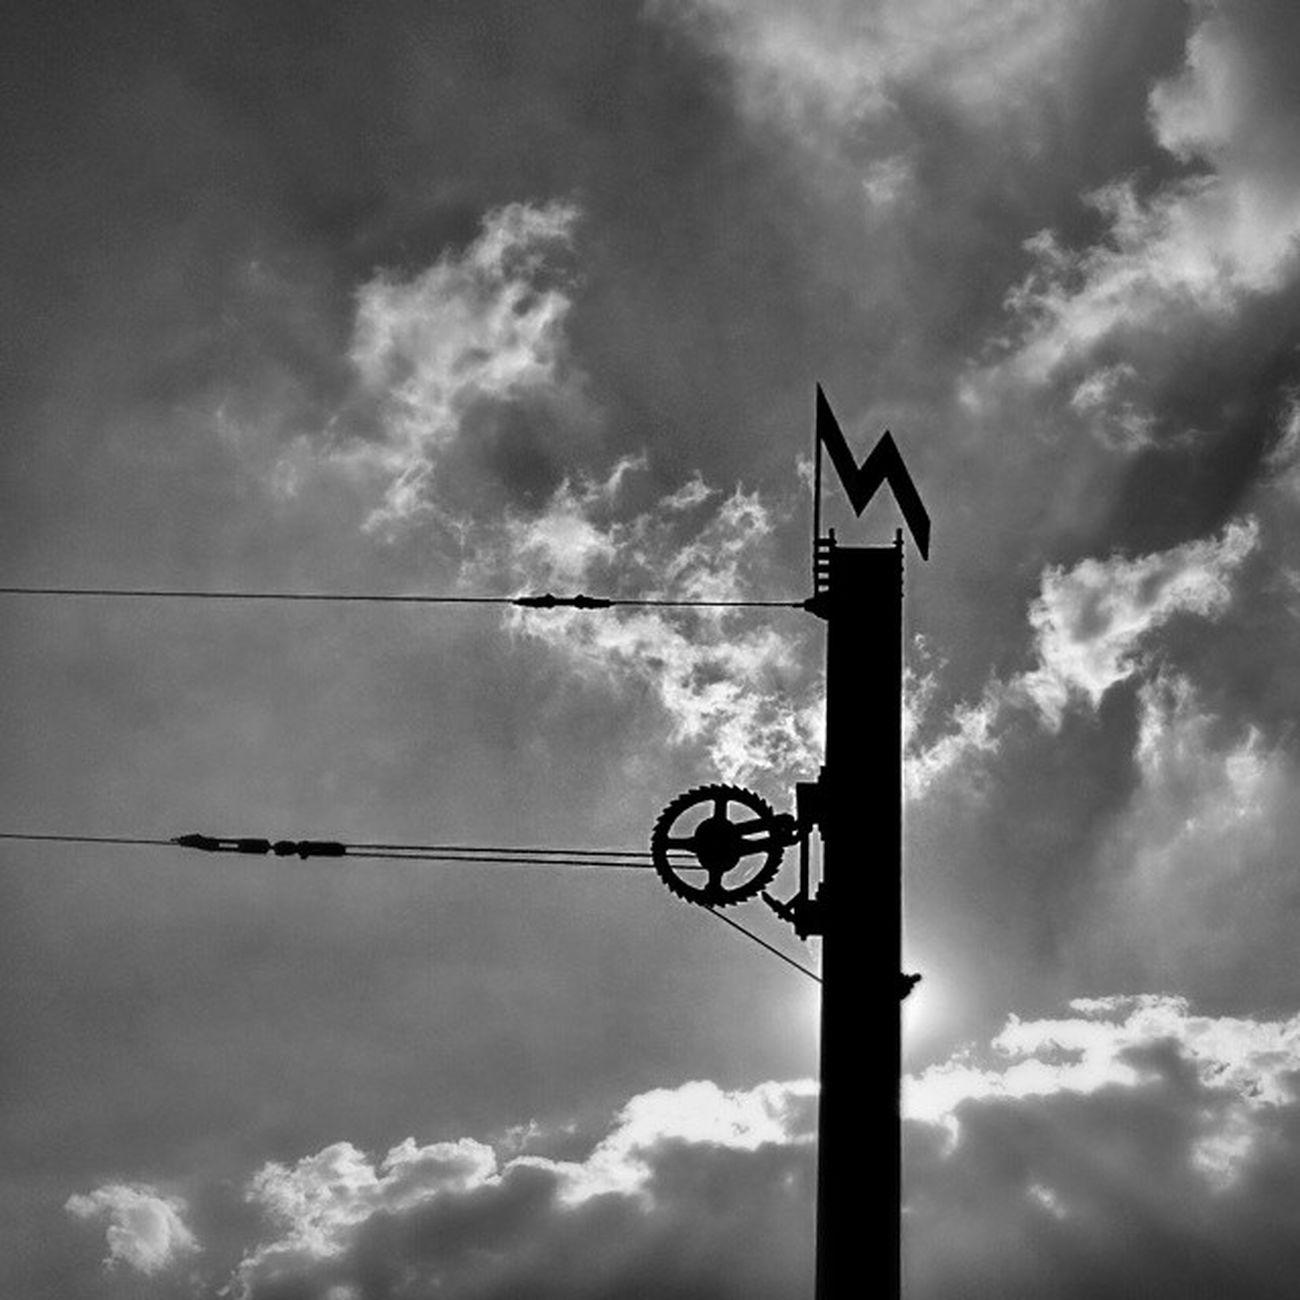 Zacke Zahnradbahn Marienplatz Silhouette clouds